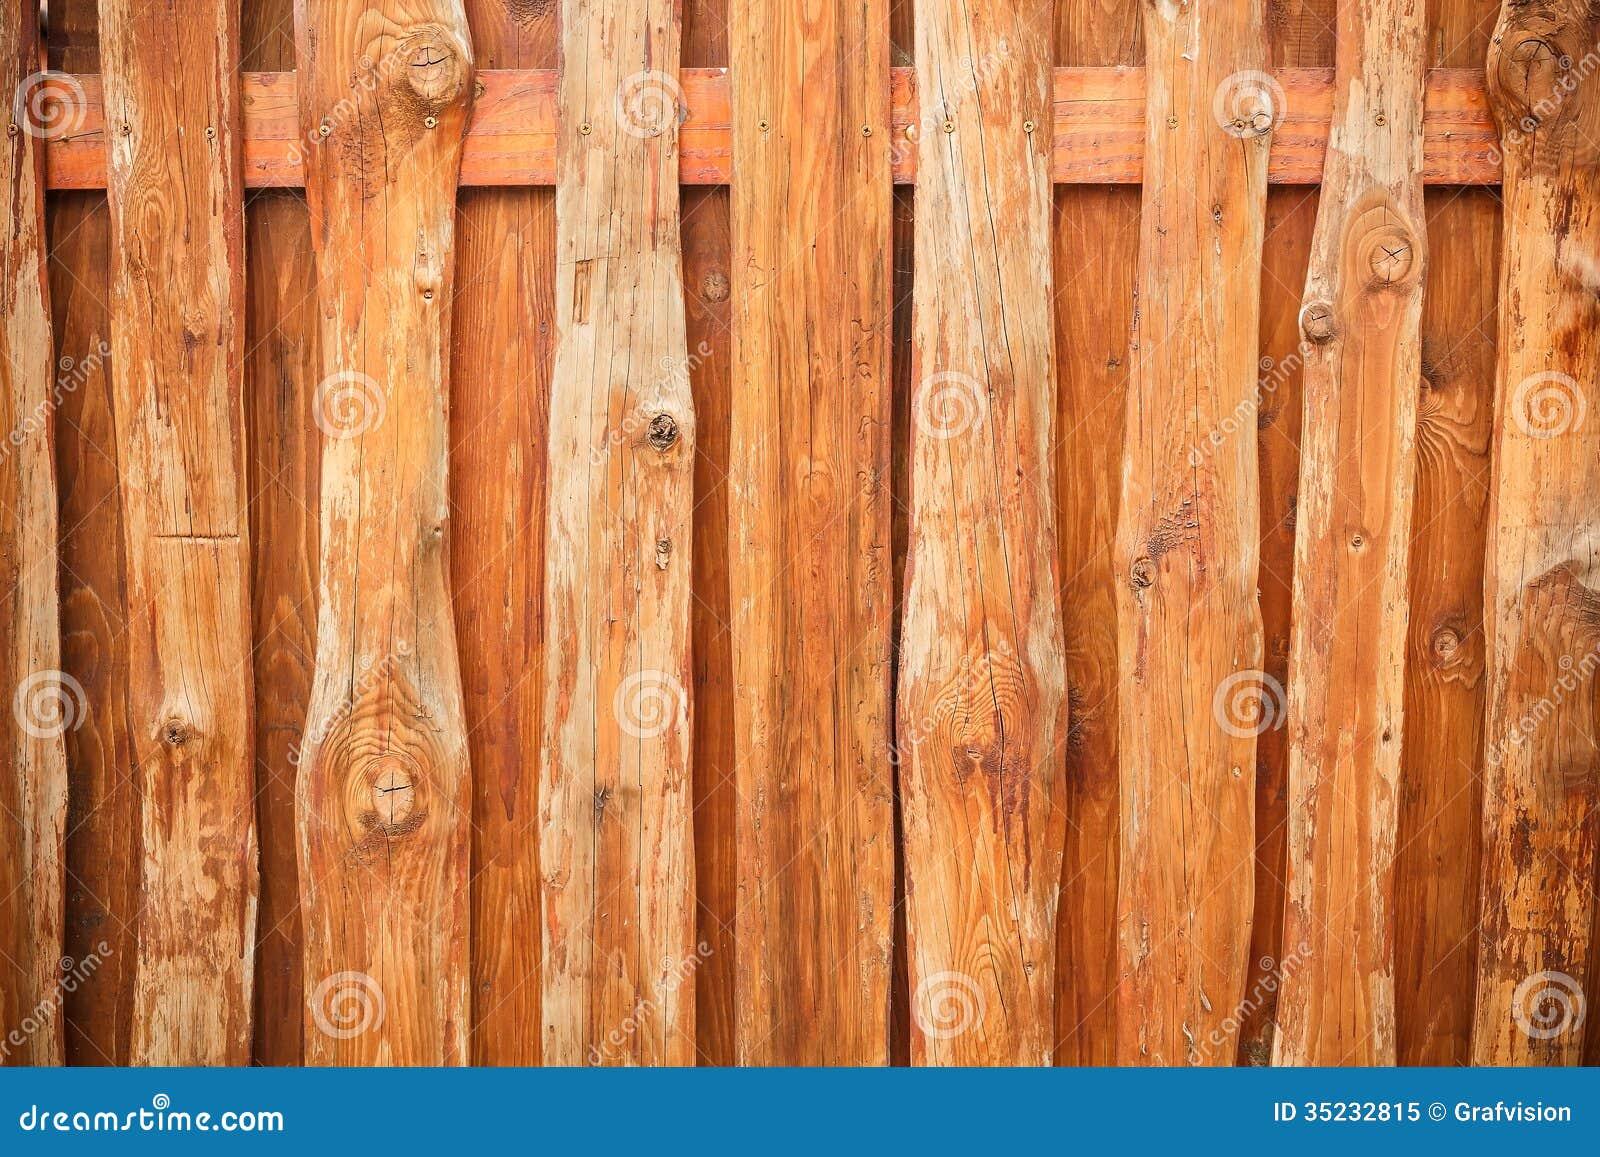 Holzerne Zaunlatten Stockbild Bild Von Zersplittert 35232815